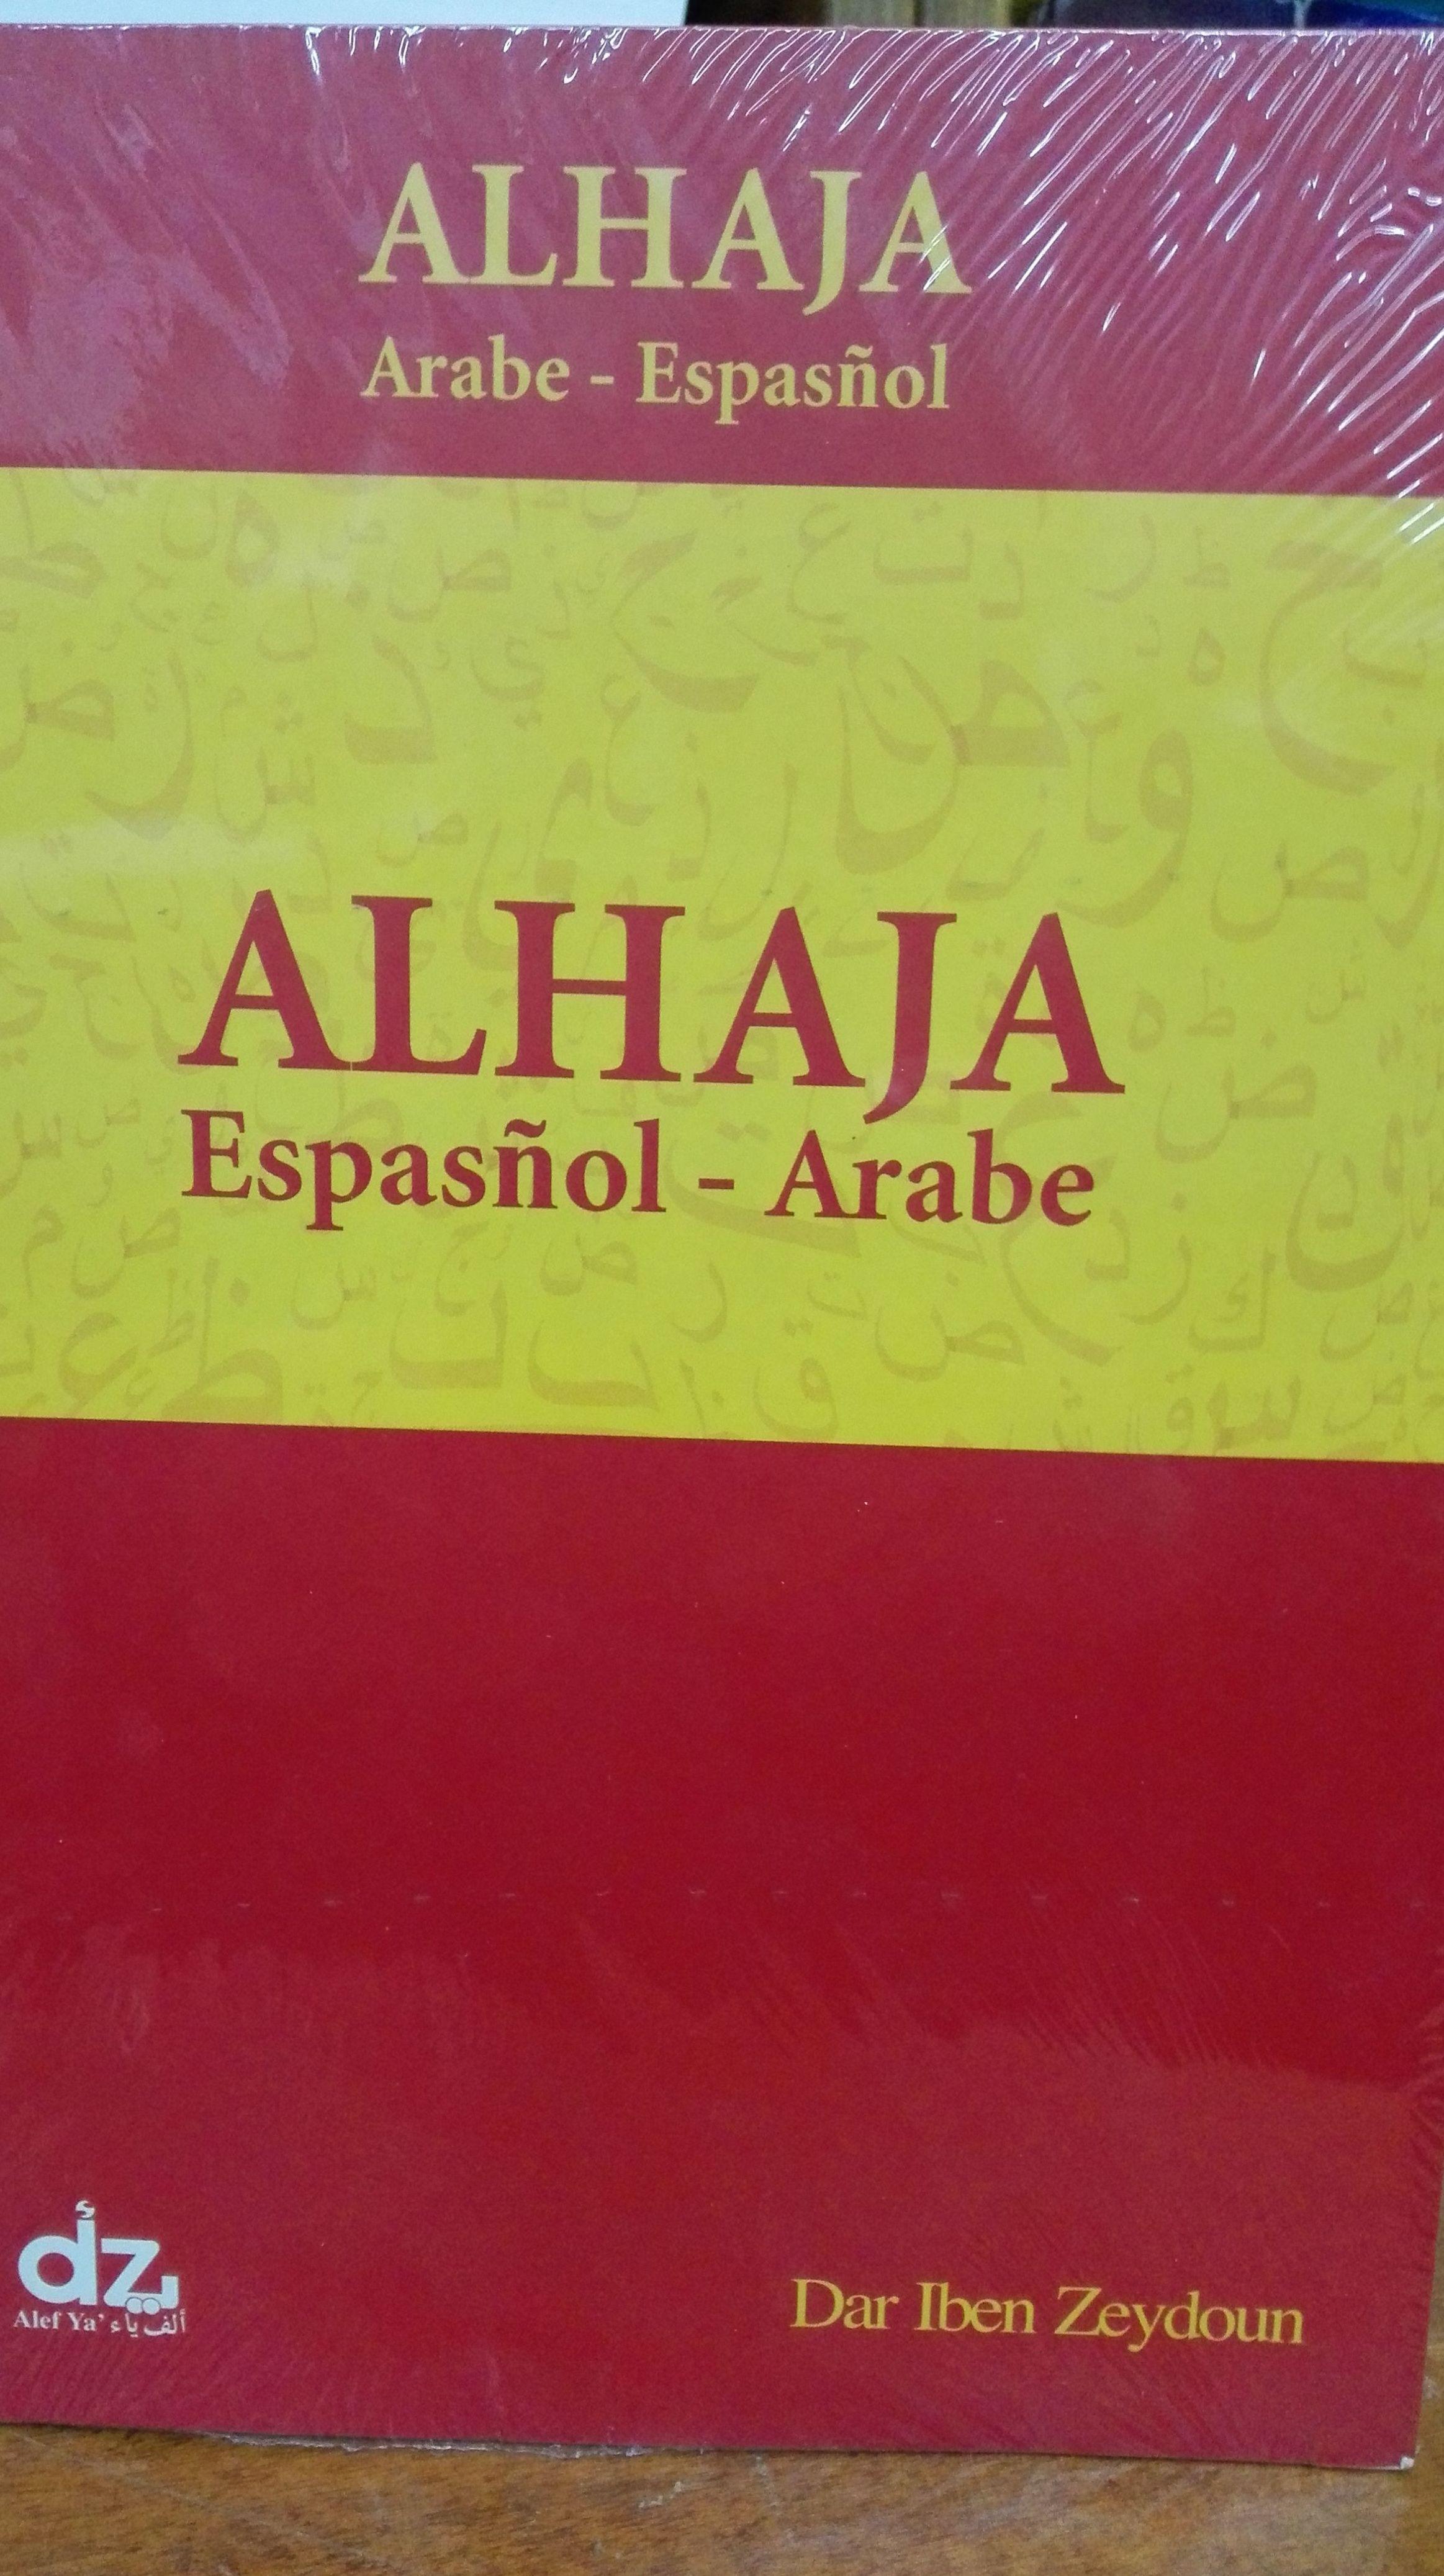 Diccionario ALHAJA (Arabe-Español)